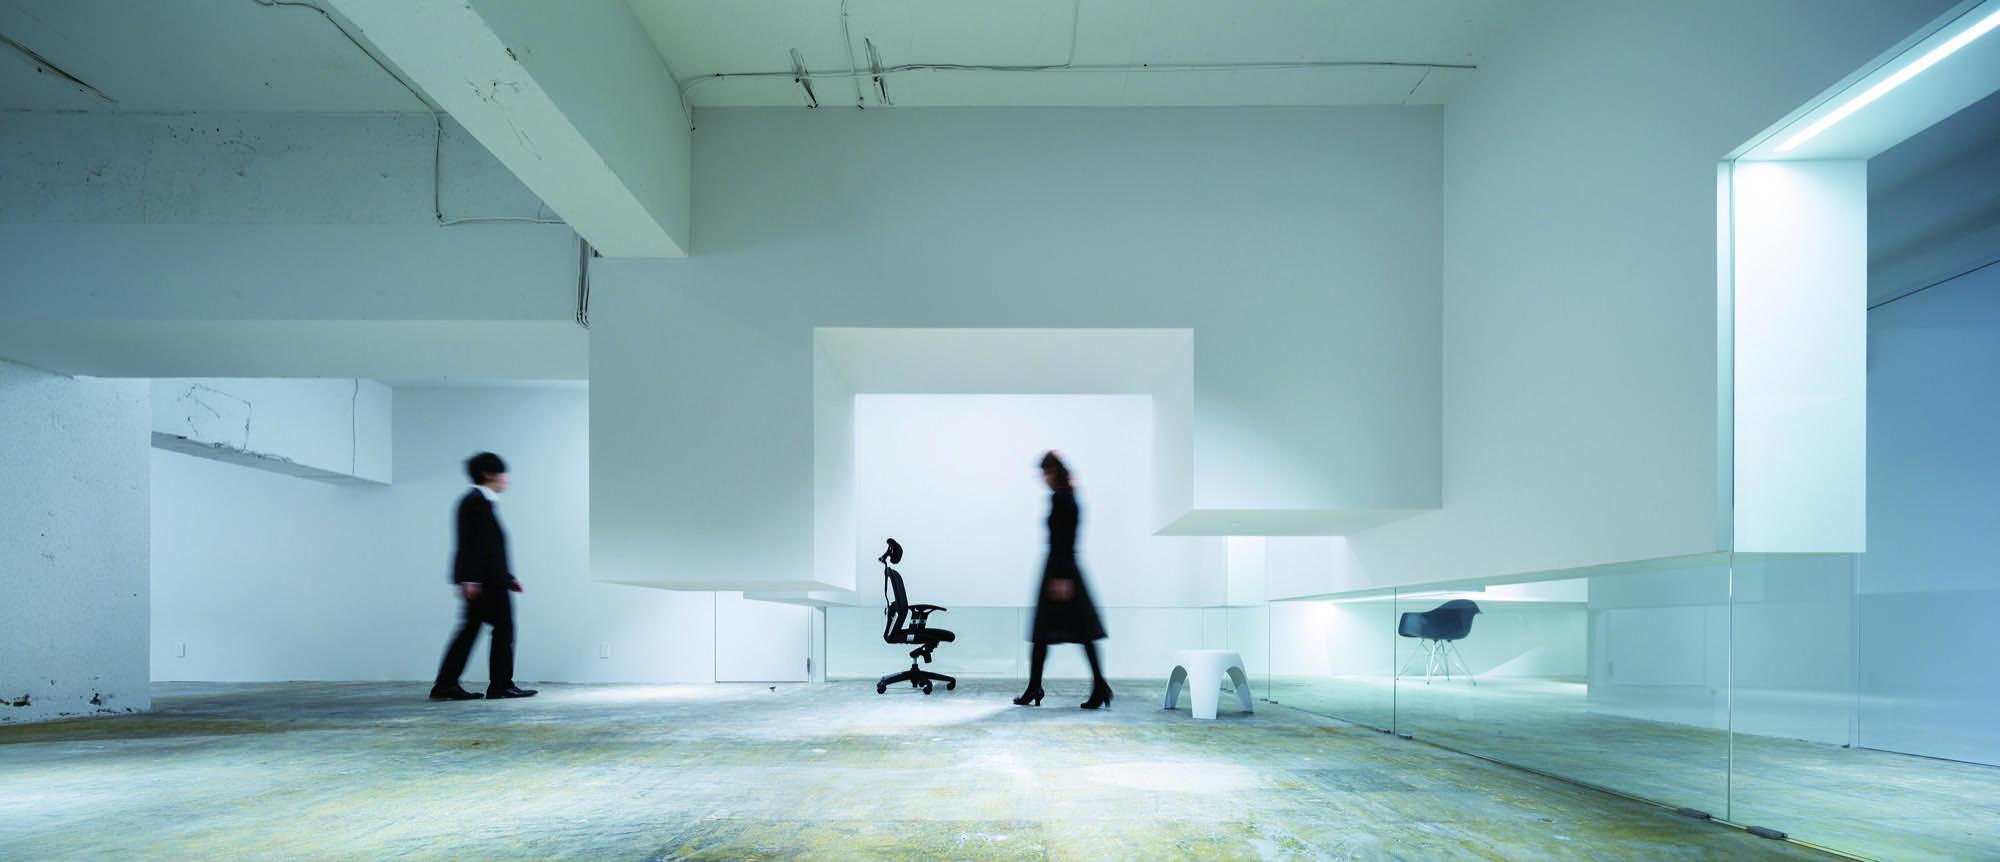 Wall Cloud Sasaki Architecture Archdaily